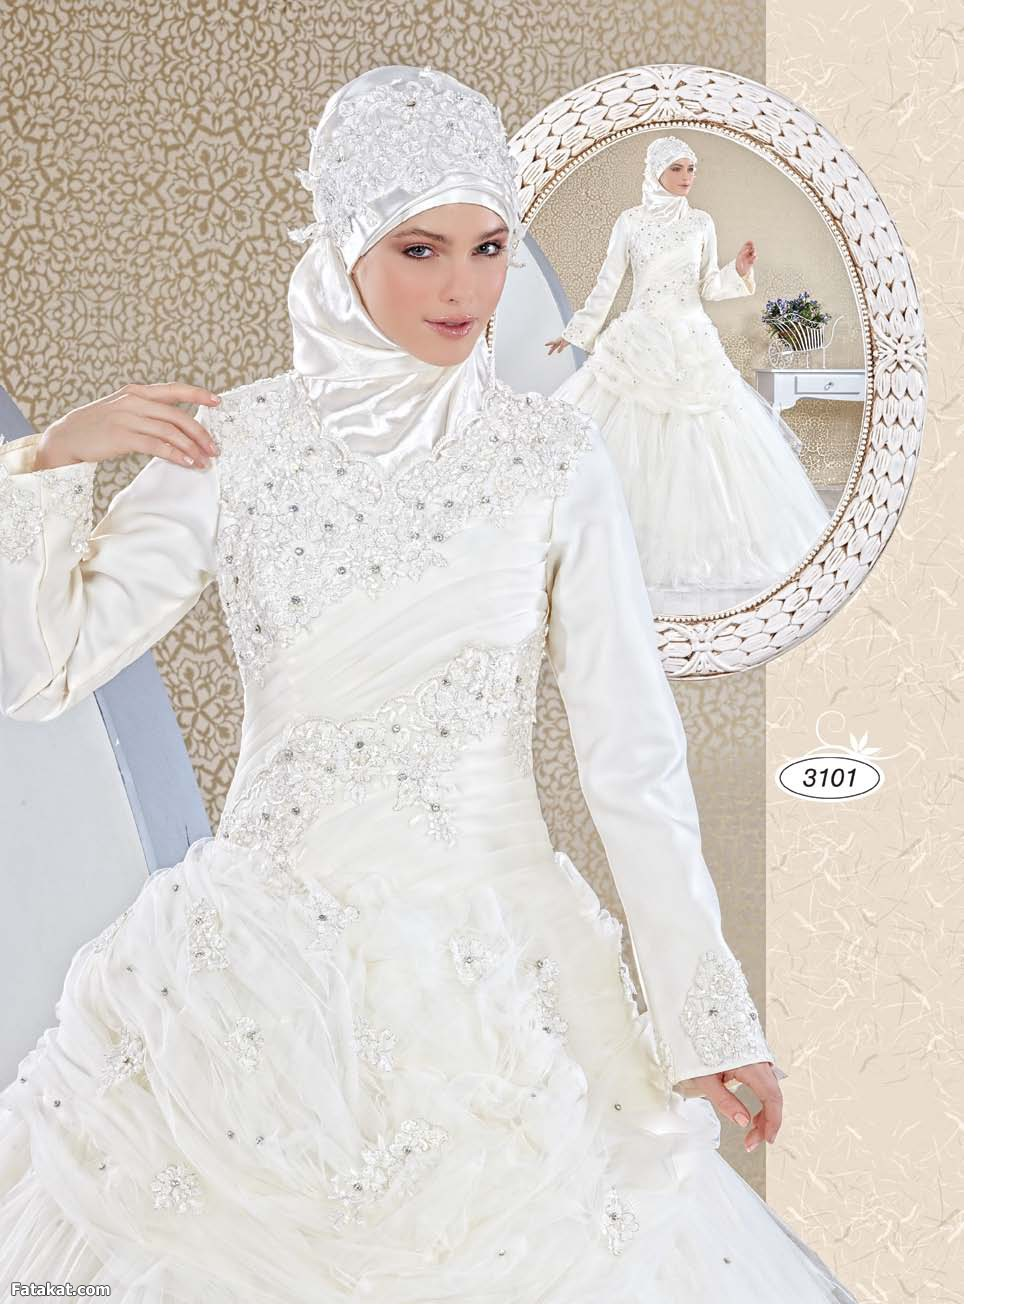 بالصور فساتين اعراس للمحجبات , اجمل فساتين للافراح بالحجاب 1254